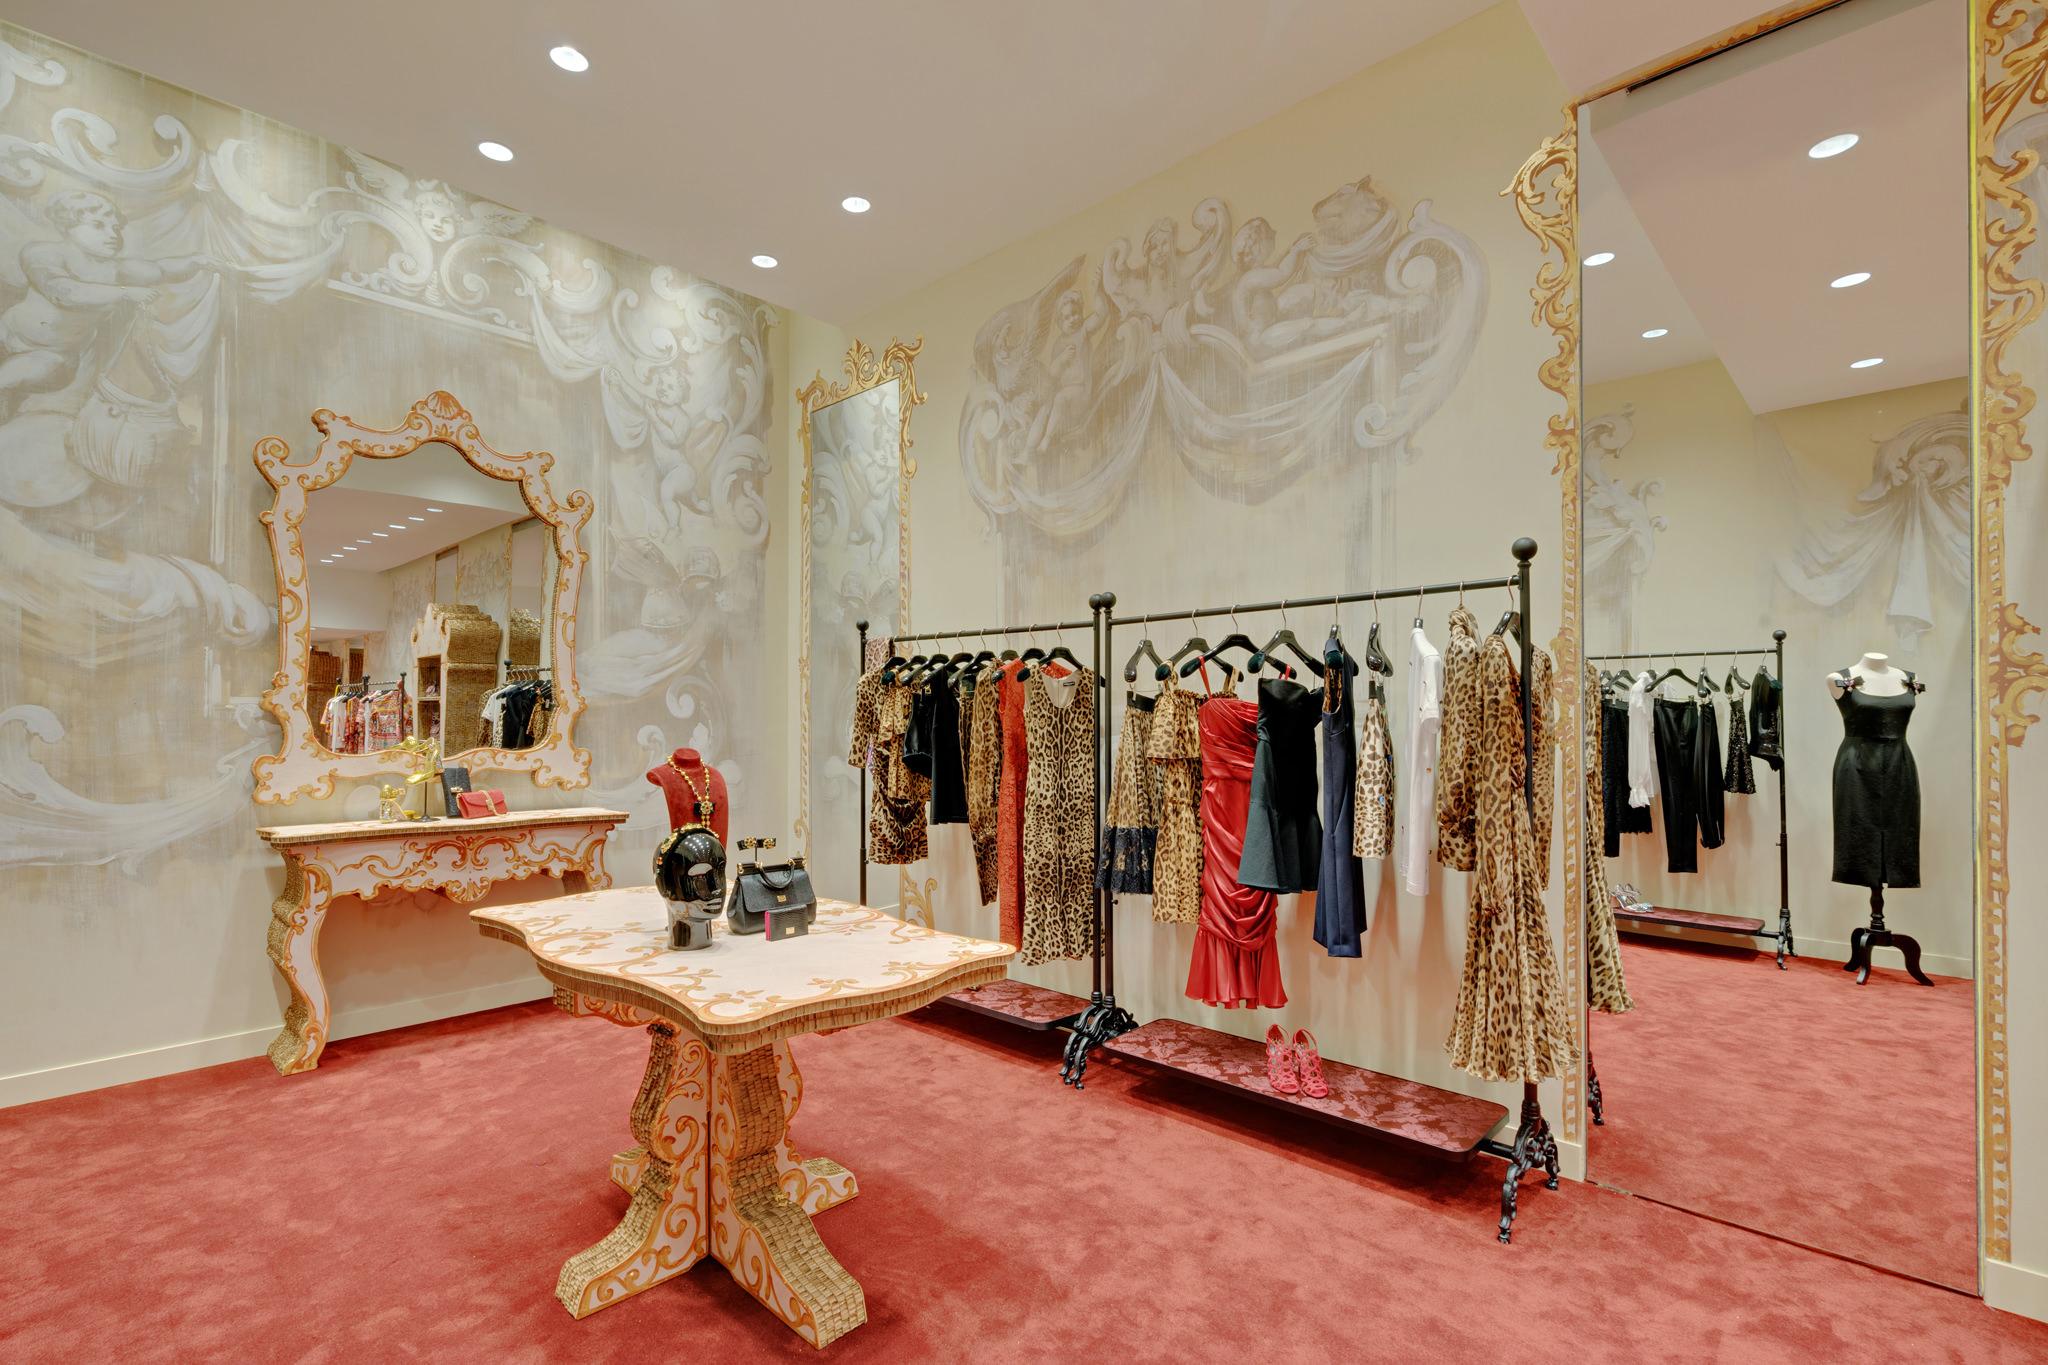 20170123 - Dolce & Gabbana - HCM - Commercial - Interior - Store - Retouch 0005.jpg